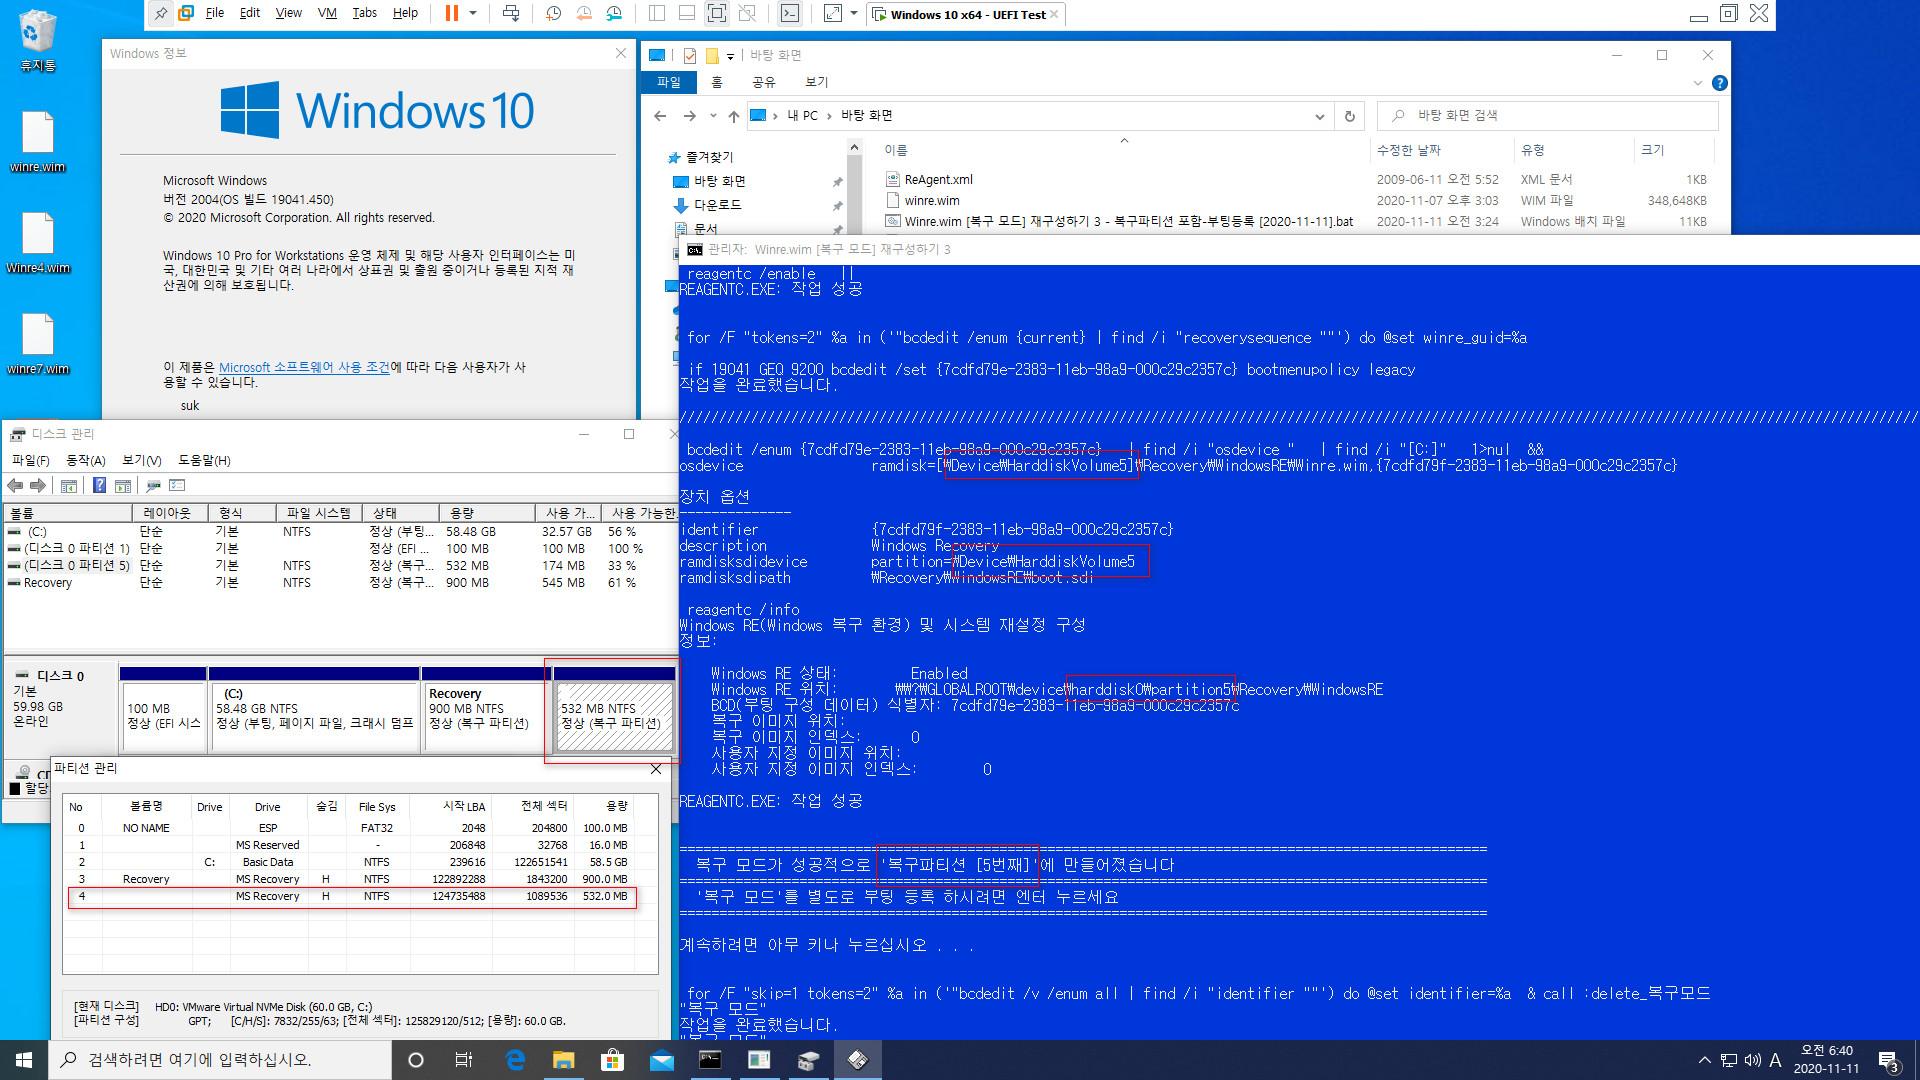 Winre.wim [복구 모드] 재구성하기 3 - 복구파티션 포함 [2020-11-11].bat 테스트 2020-11-11_064004.jpg